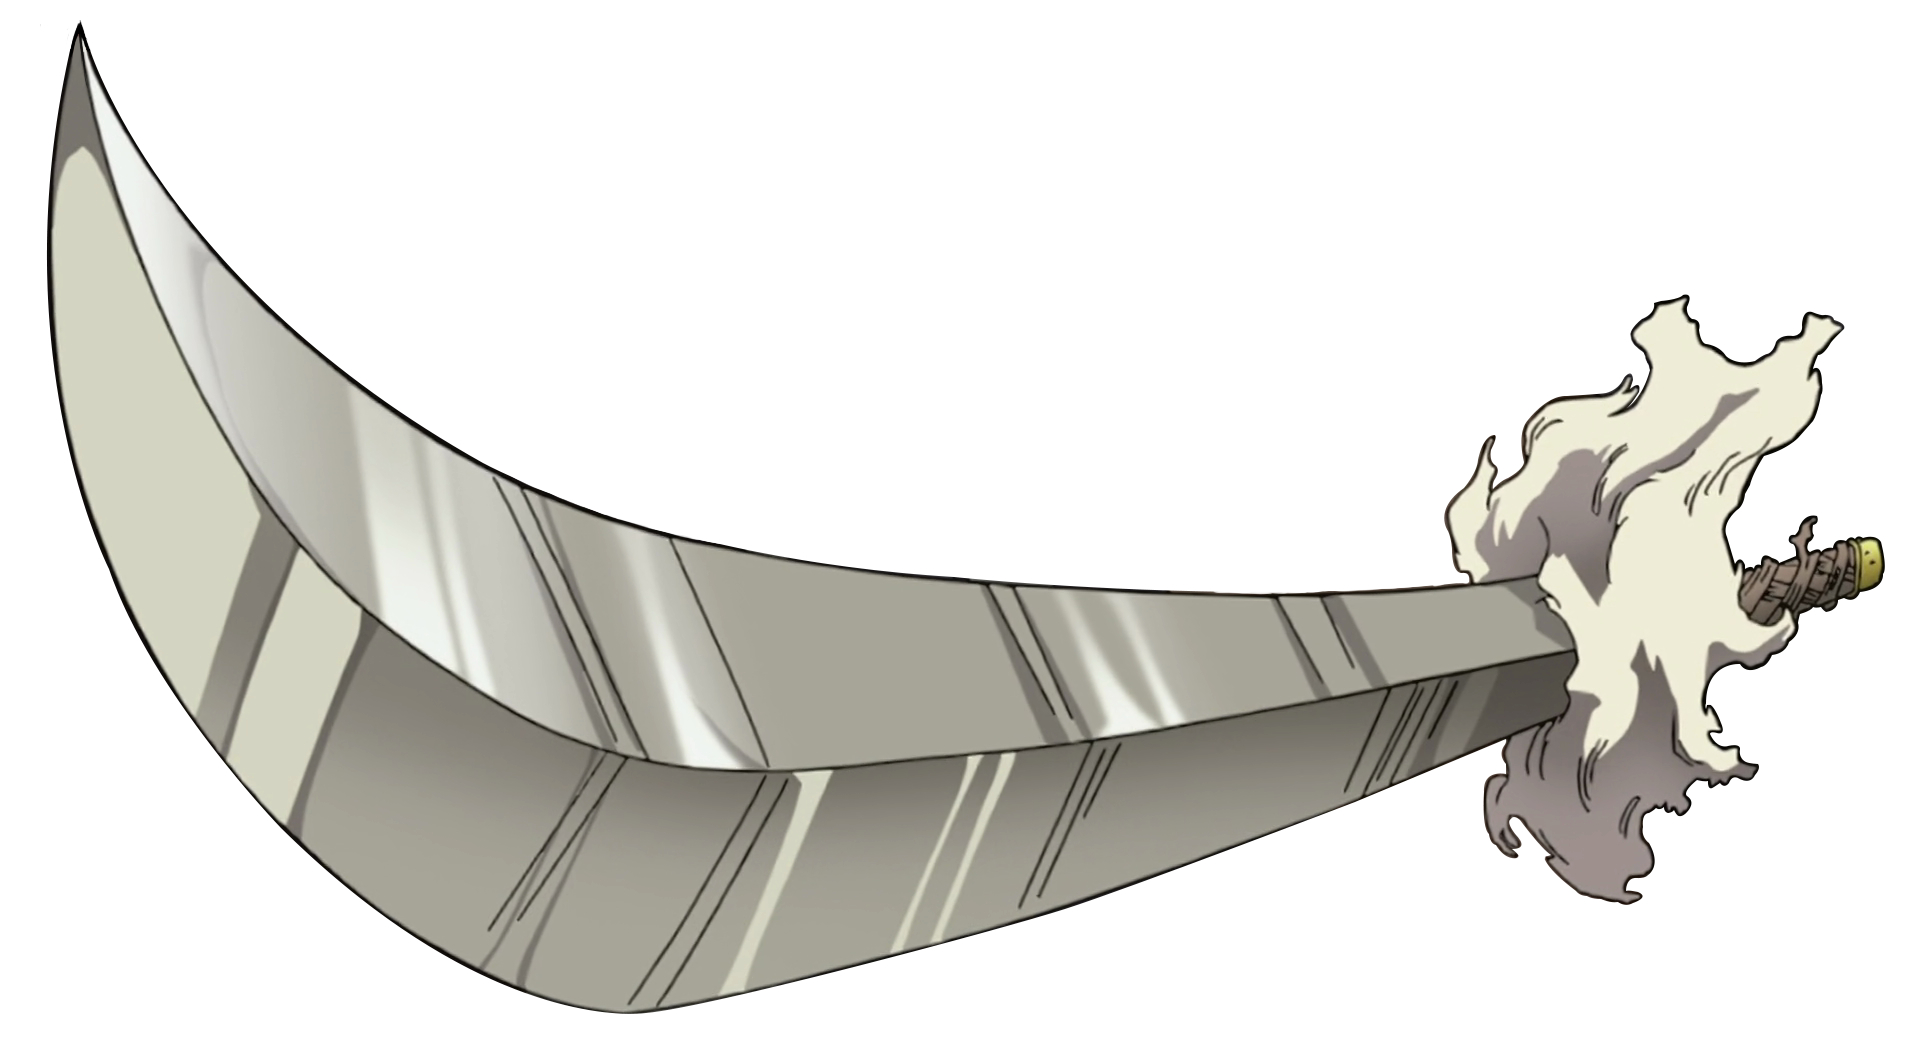 http://images4.wikia.nocookie.net/__cb20120708023726/inuyasha/images/b/b6/Inuyasha_and_Tessaiga_Sword.jpg